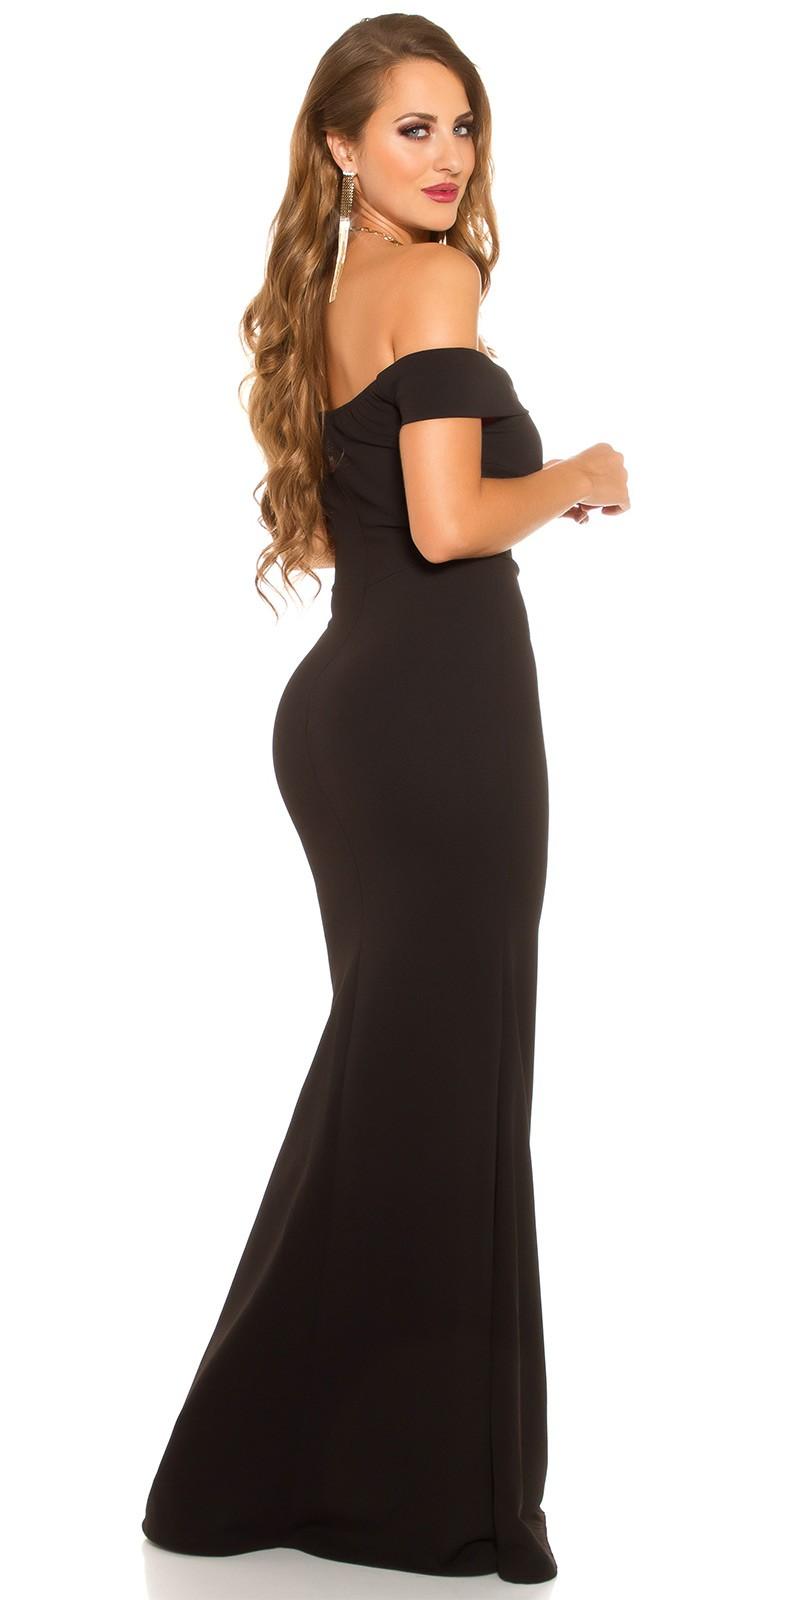 e2d9c7ca51a3 eeRedCarpetLook Evening Gown off shoulder  Color BLACK Size Einheitsgroesse 0000K6039 SCHWARZ 24